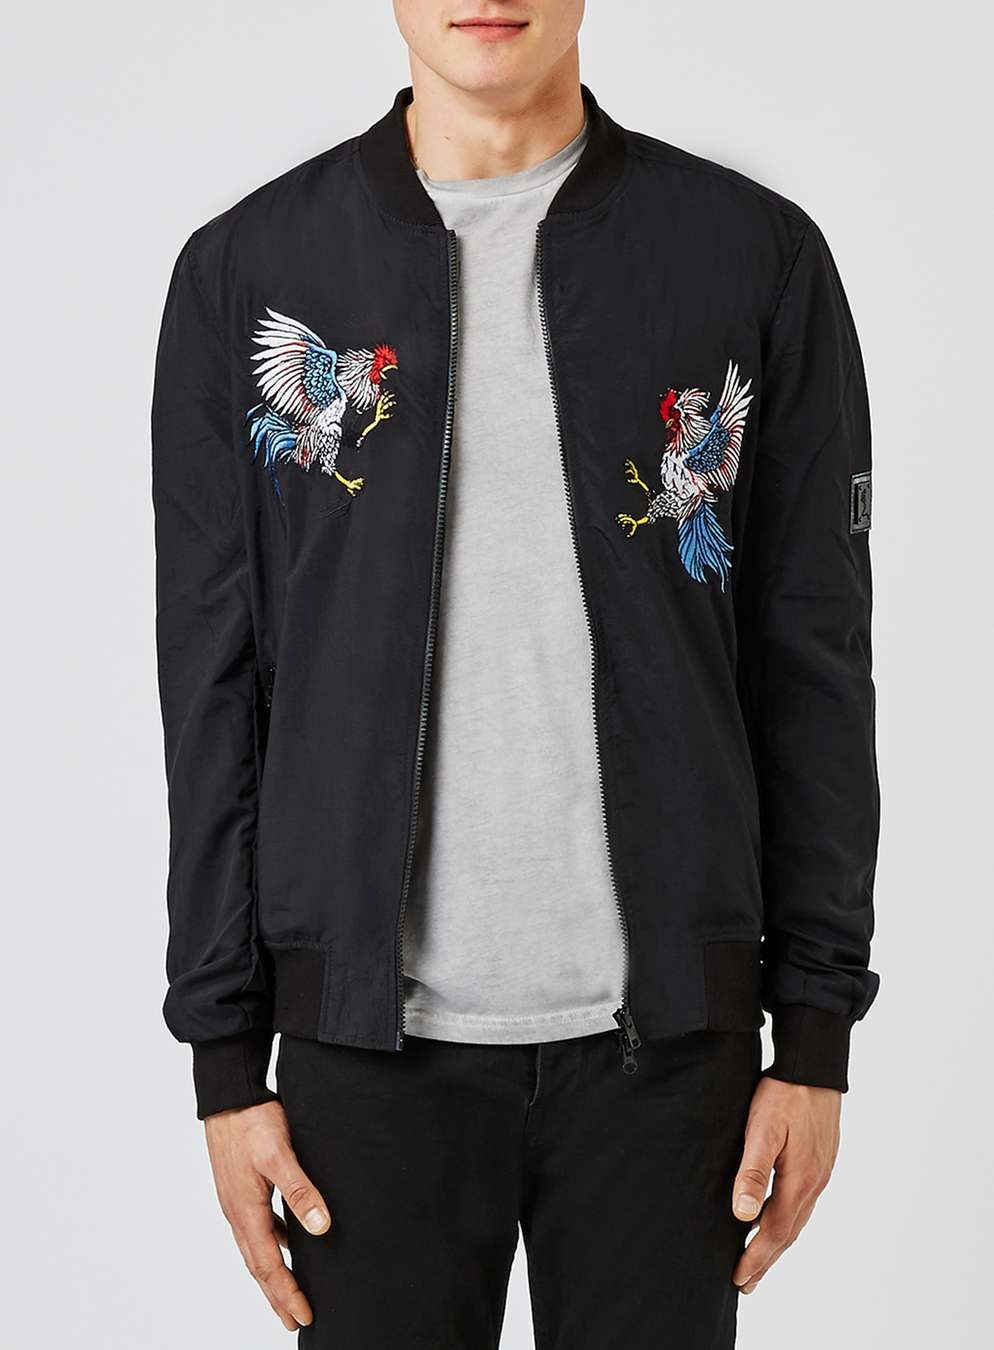 RELIGION Black Embroidered Bomber Jacket - Men's Coats & Jackets ...